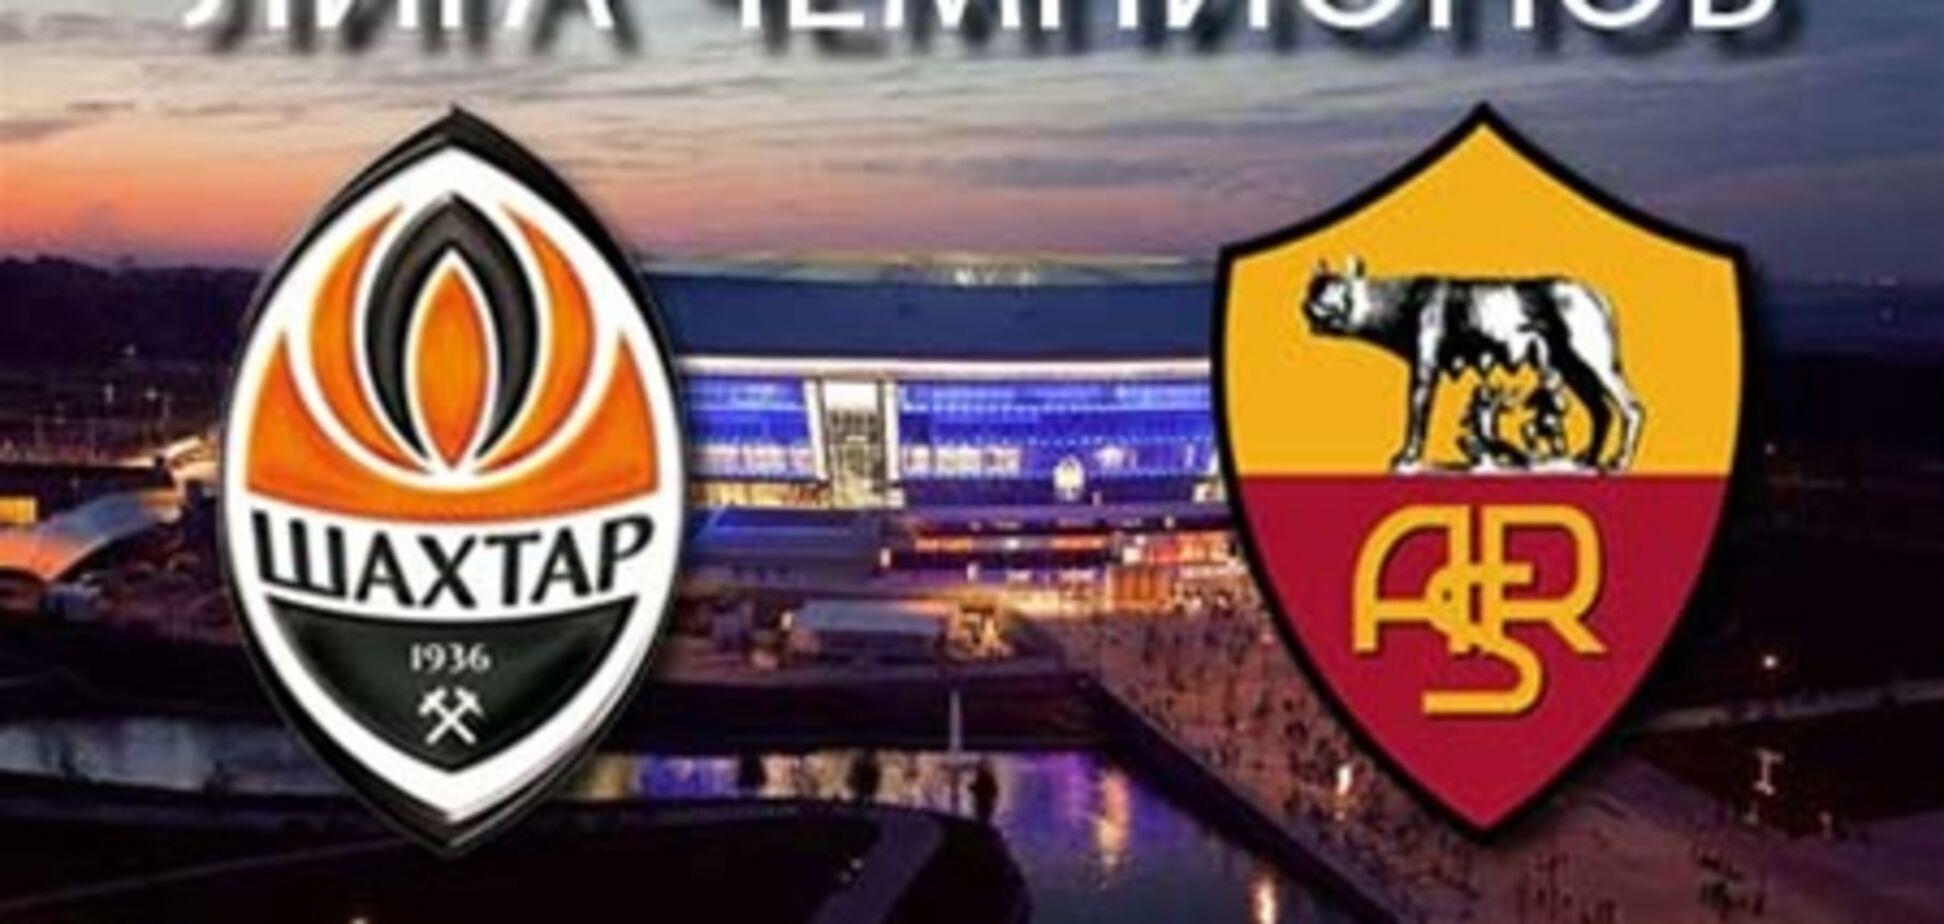 Лига чемпионов. 'Шахтер' - 'Рома' - 3:0. Хронология матча и видео голов